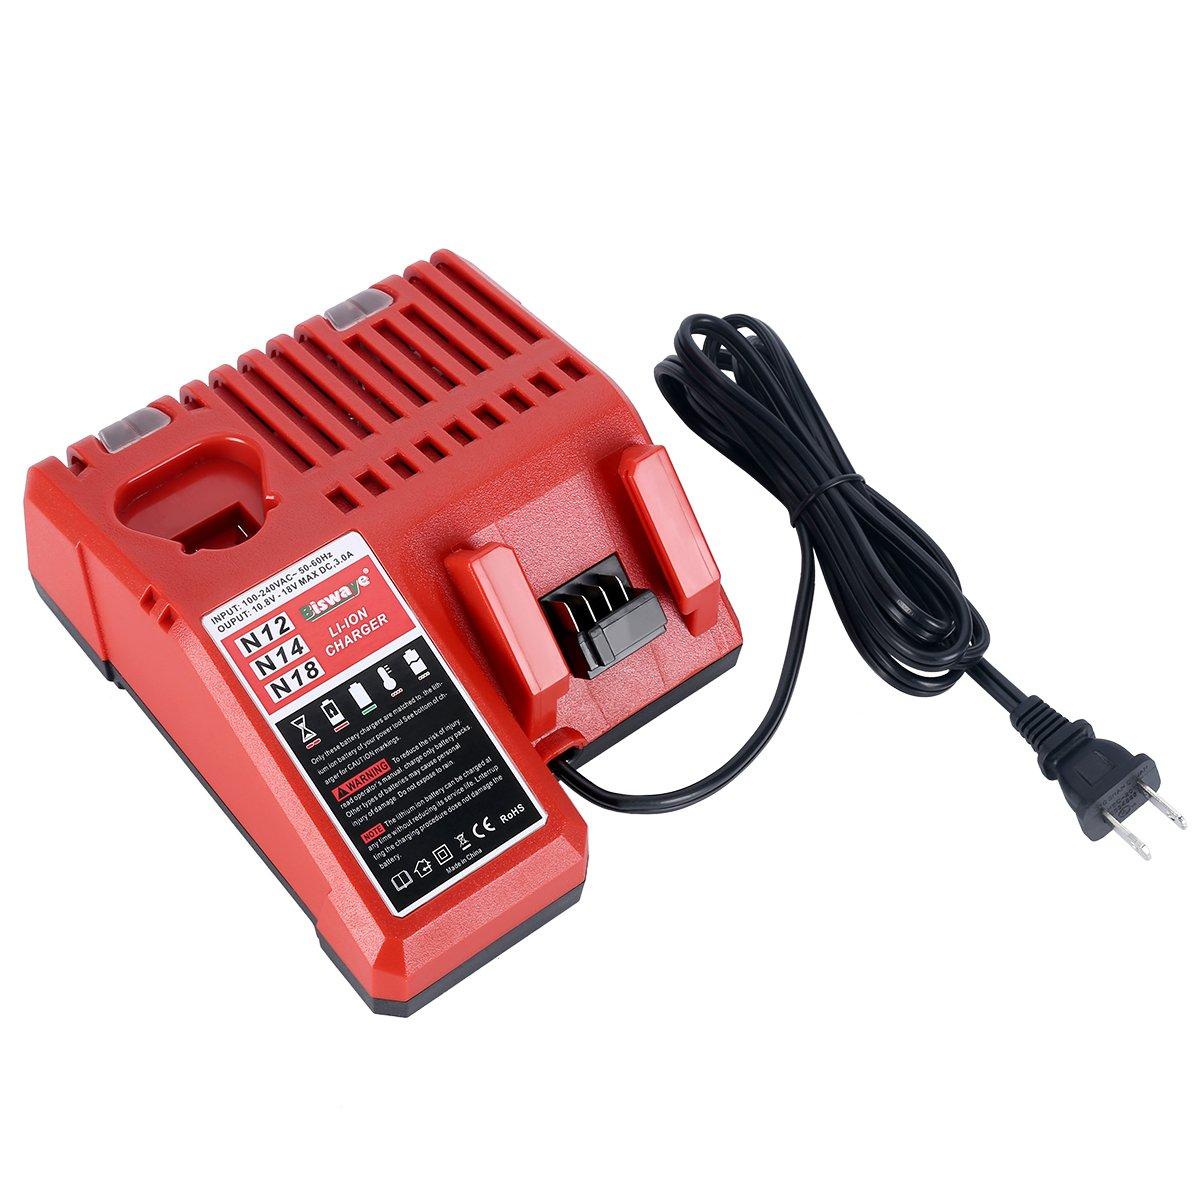 biswaye battery charger 48 59 1812 for 12v 18v milwaukee m12 m14 m18 rh amazon com